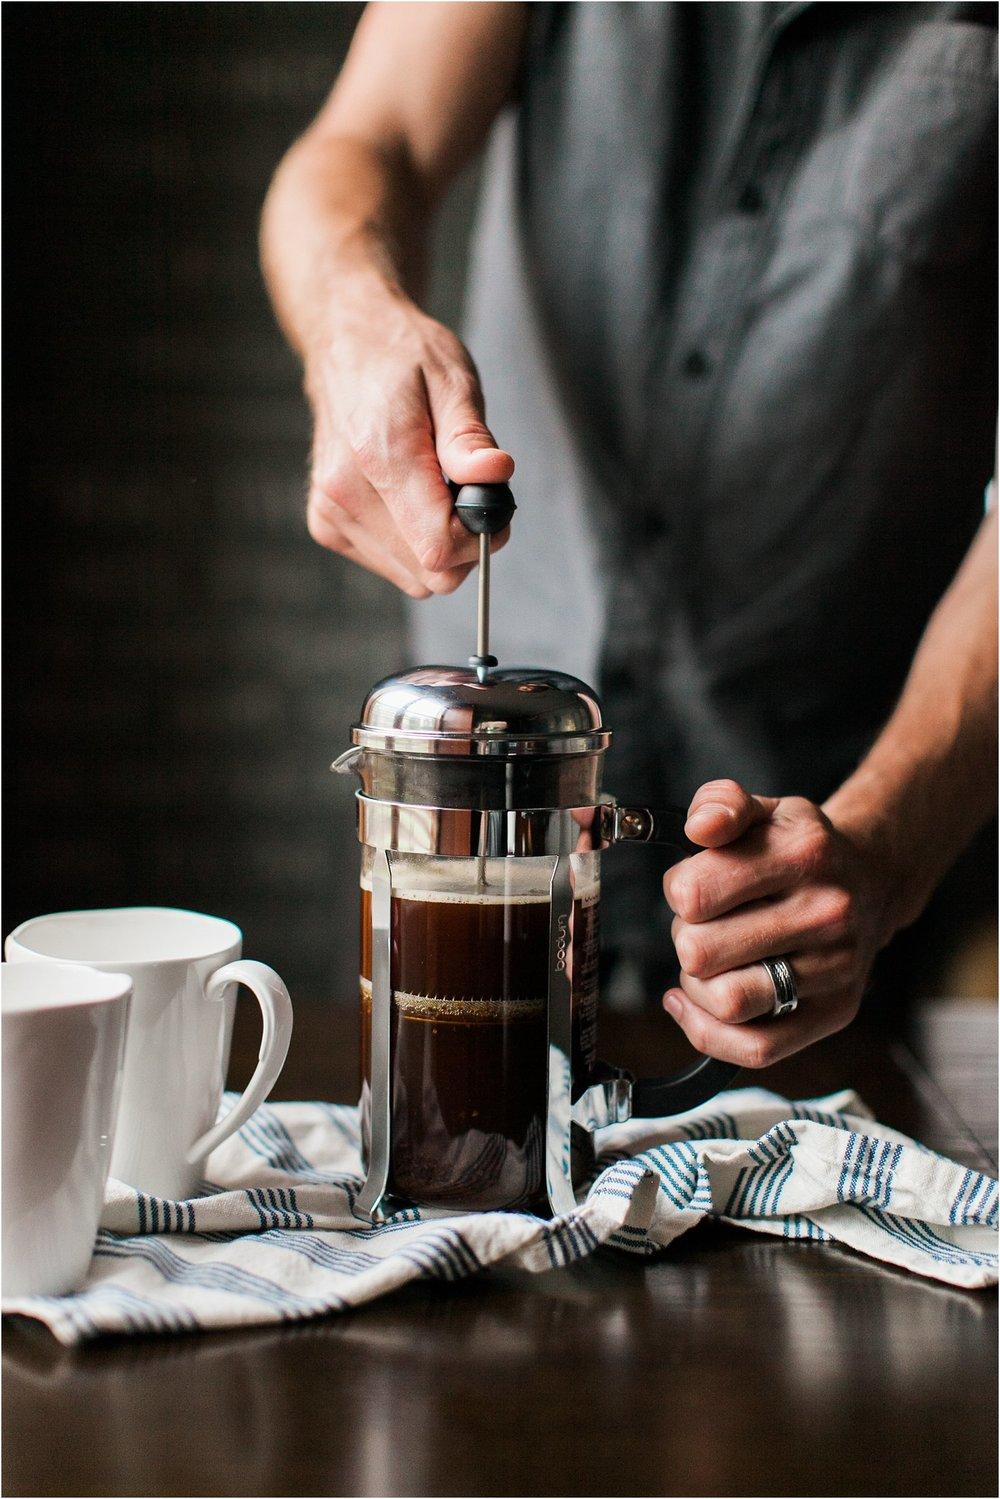 French Press Coffee + Dairy free Oat+Vanilla Creamer | Feast & Dwell